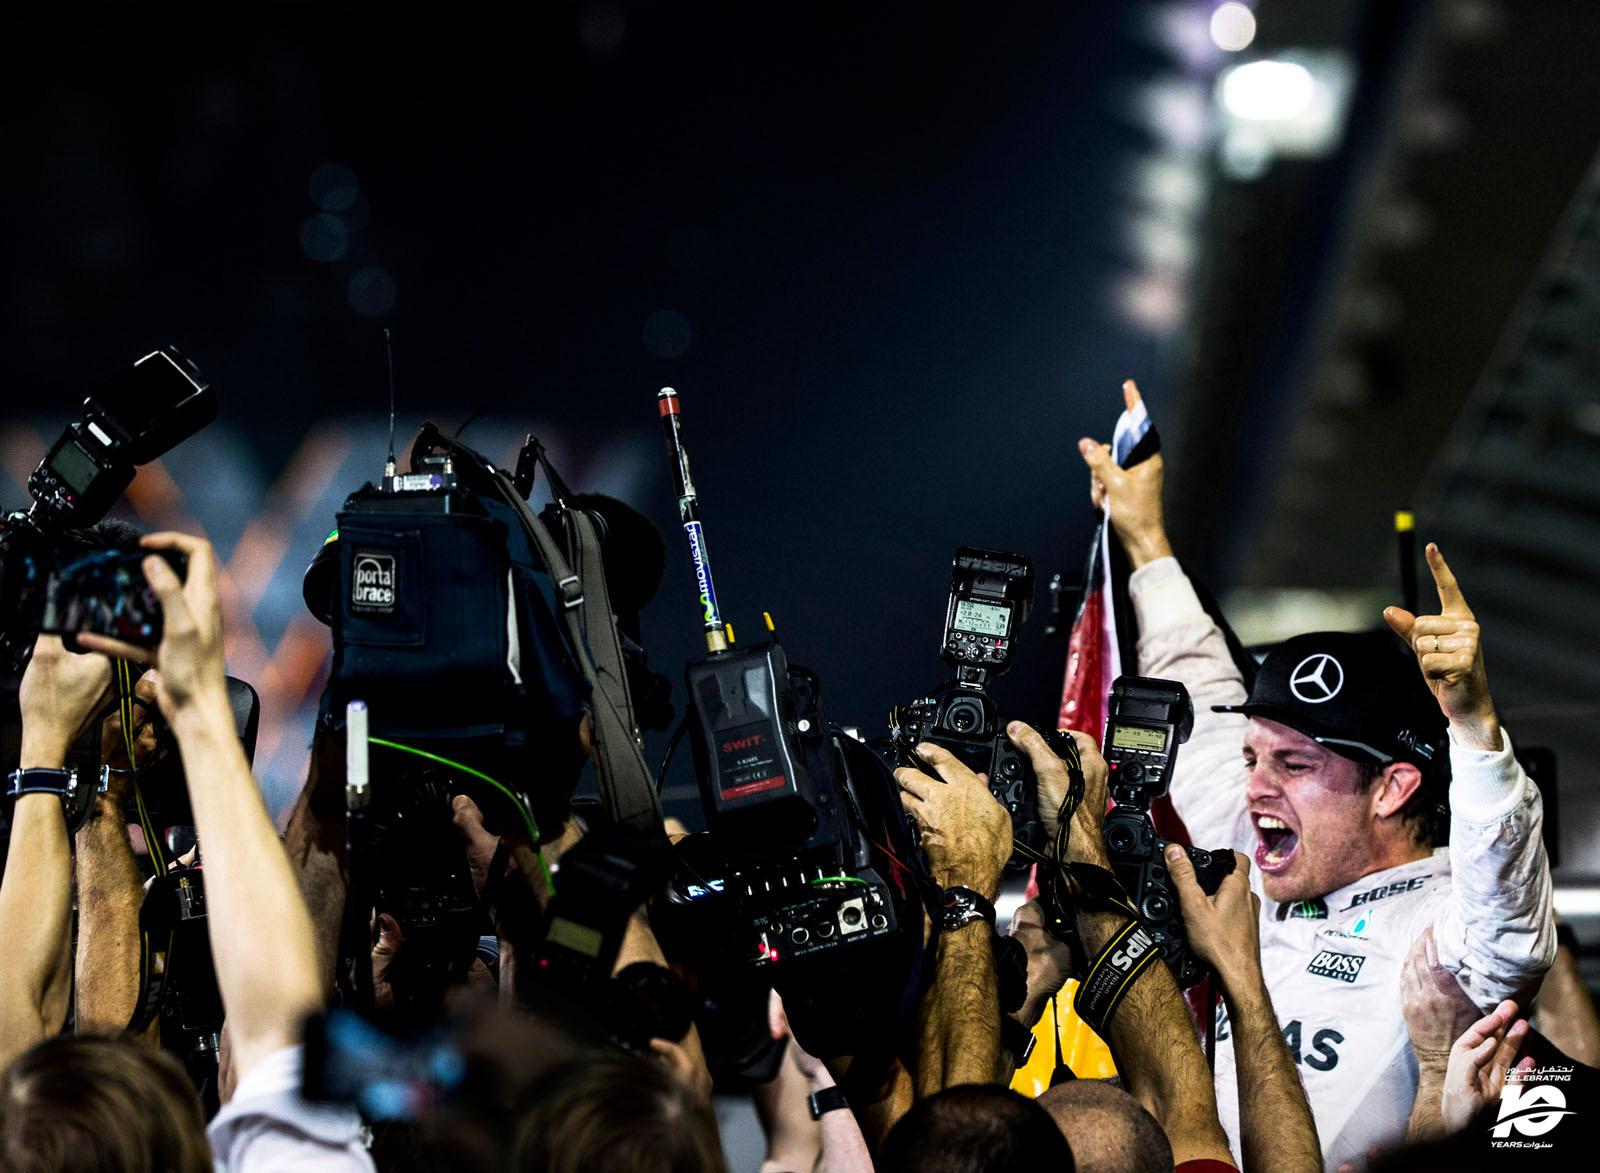 20.N.Rosberg_Abu_Dhabi'16_013_.jpg